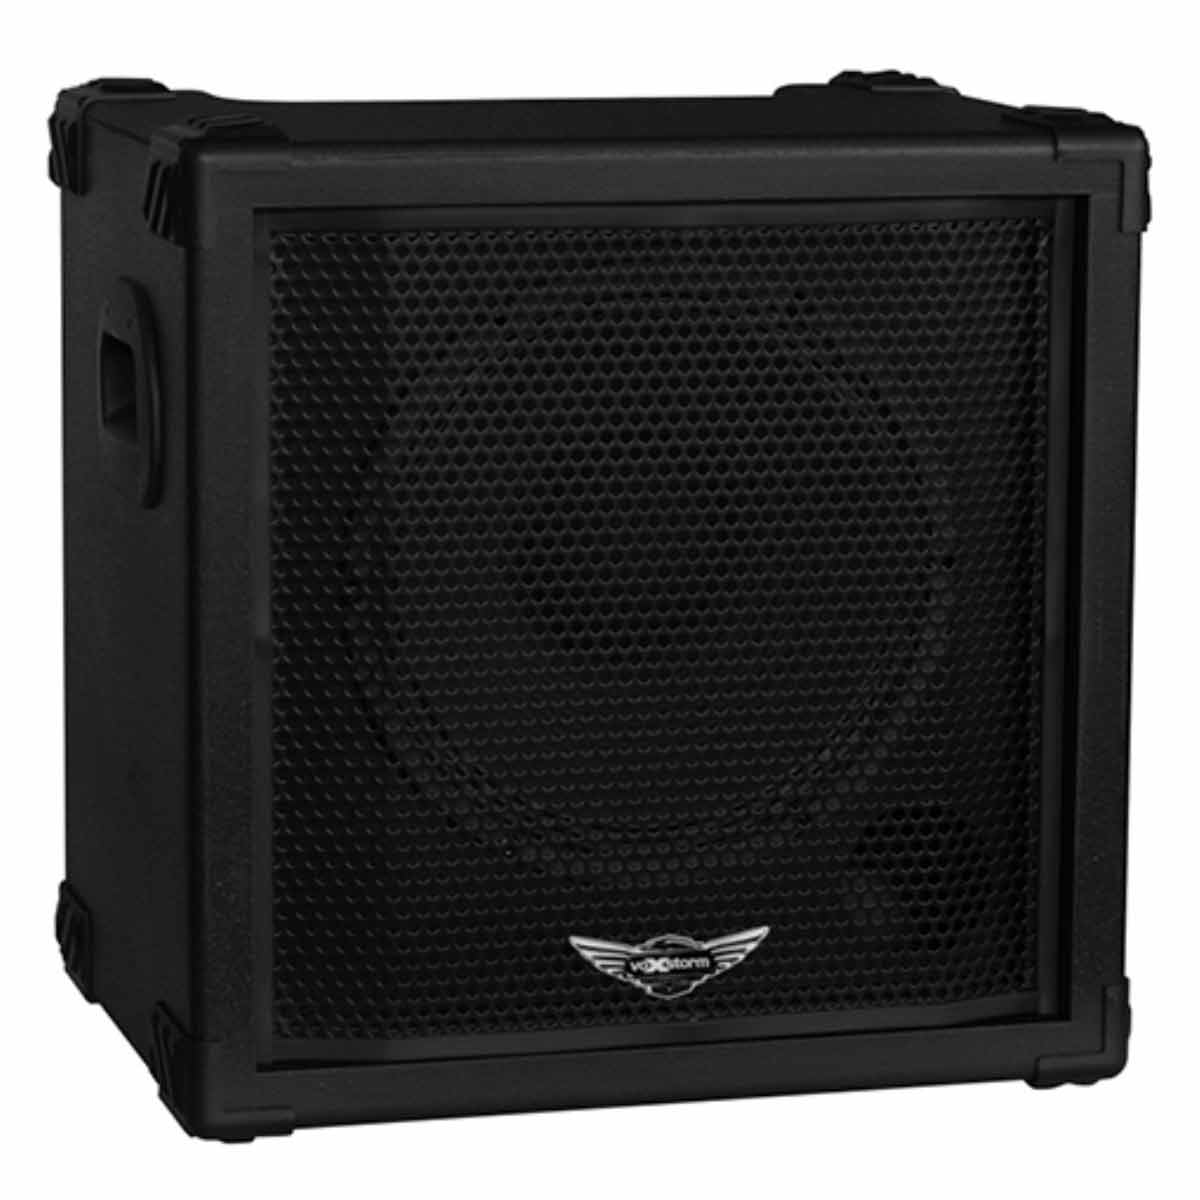 CB125 - Amplificador Combo p/ Contrabaixo 75W Top Bass CB 125 - Voxstorm